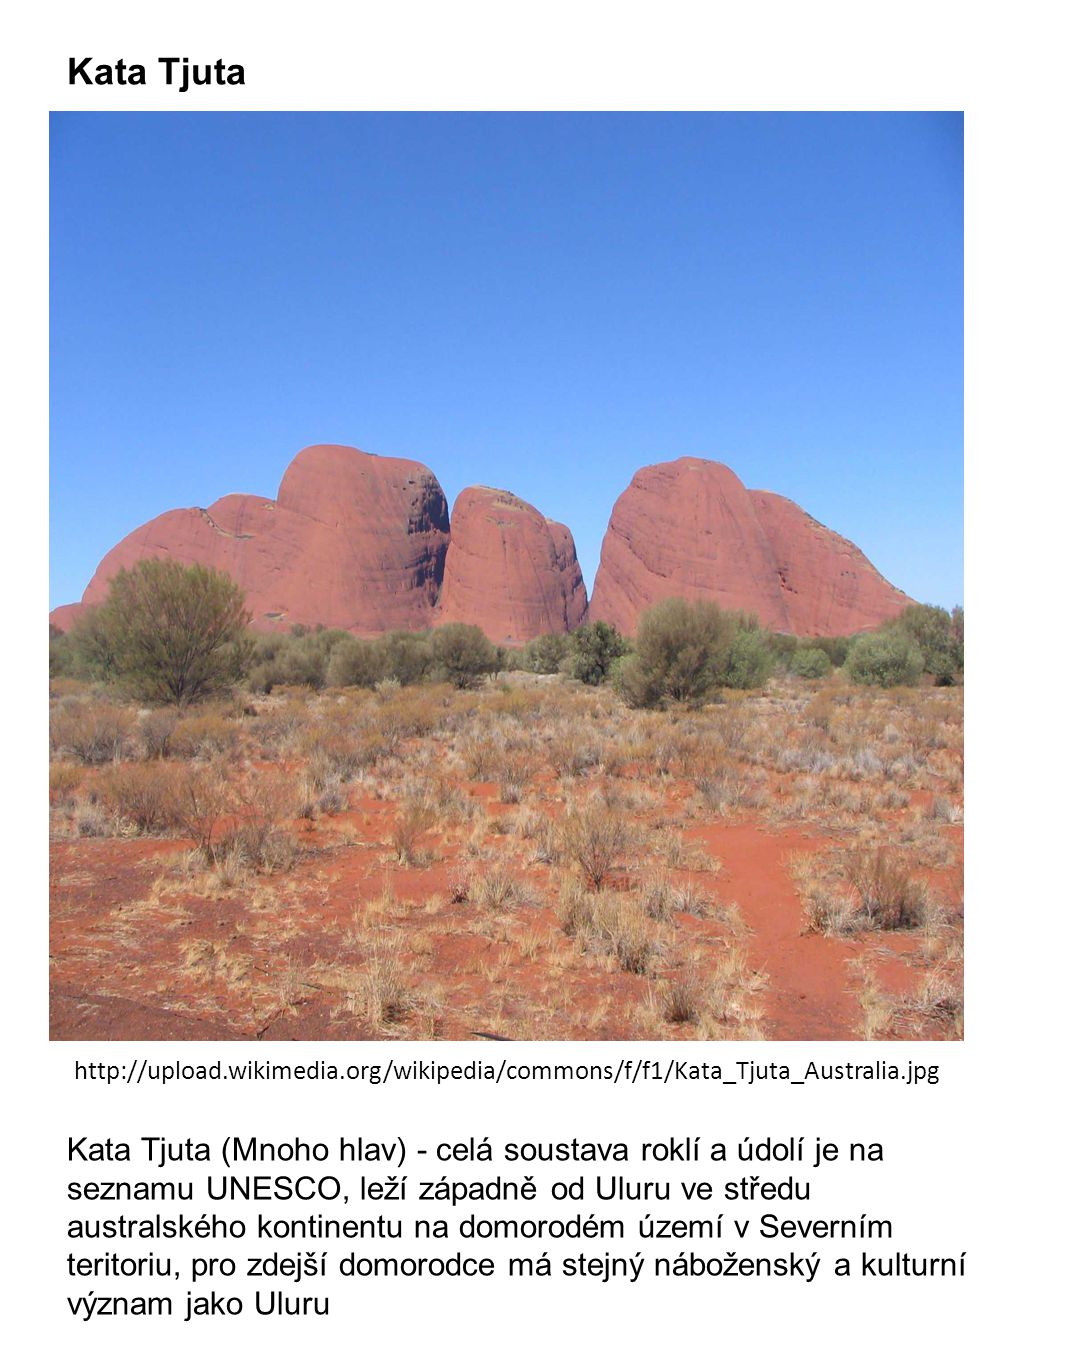 Kata Tjuta http://upload.wikimedia.org/wikipedia/commons/f/f1/Kata_Tjuta_Australia.jpg.